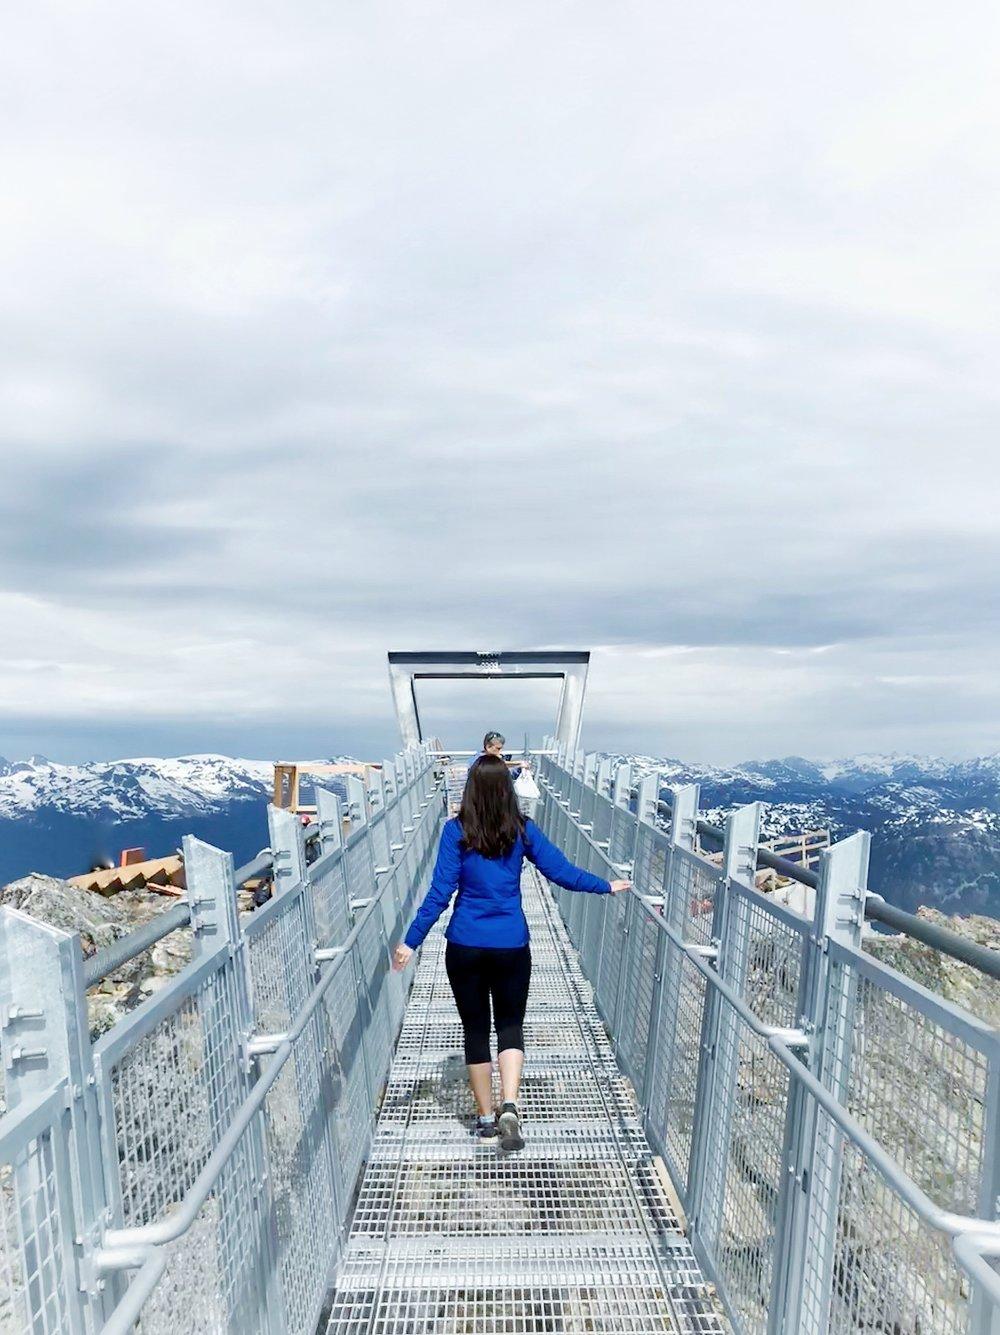 West Ridge platform views on Whistler Blackcomb mountain